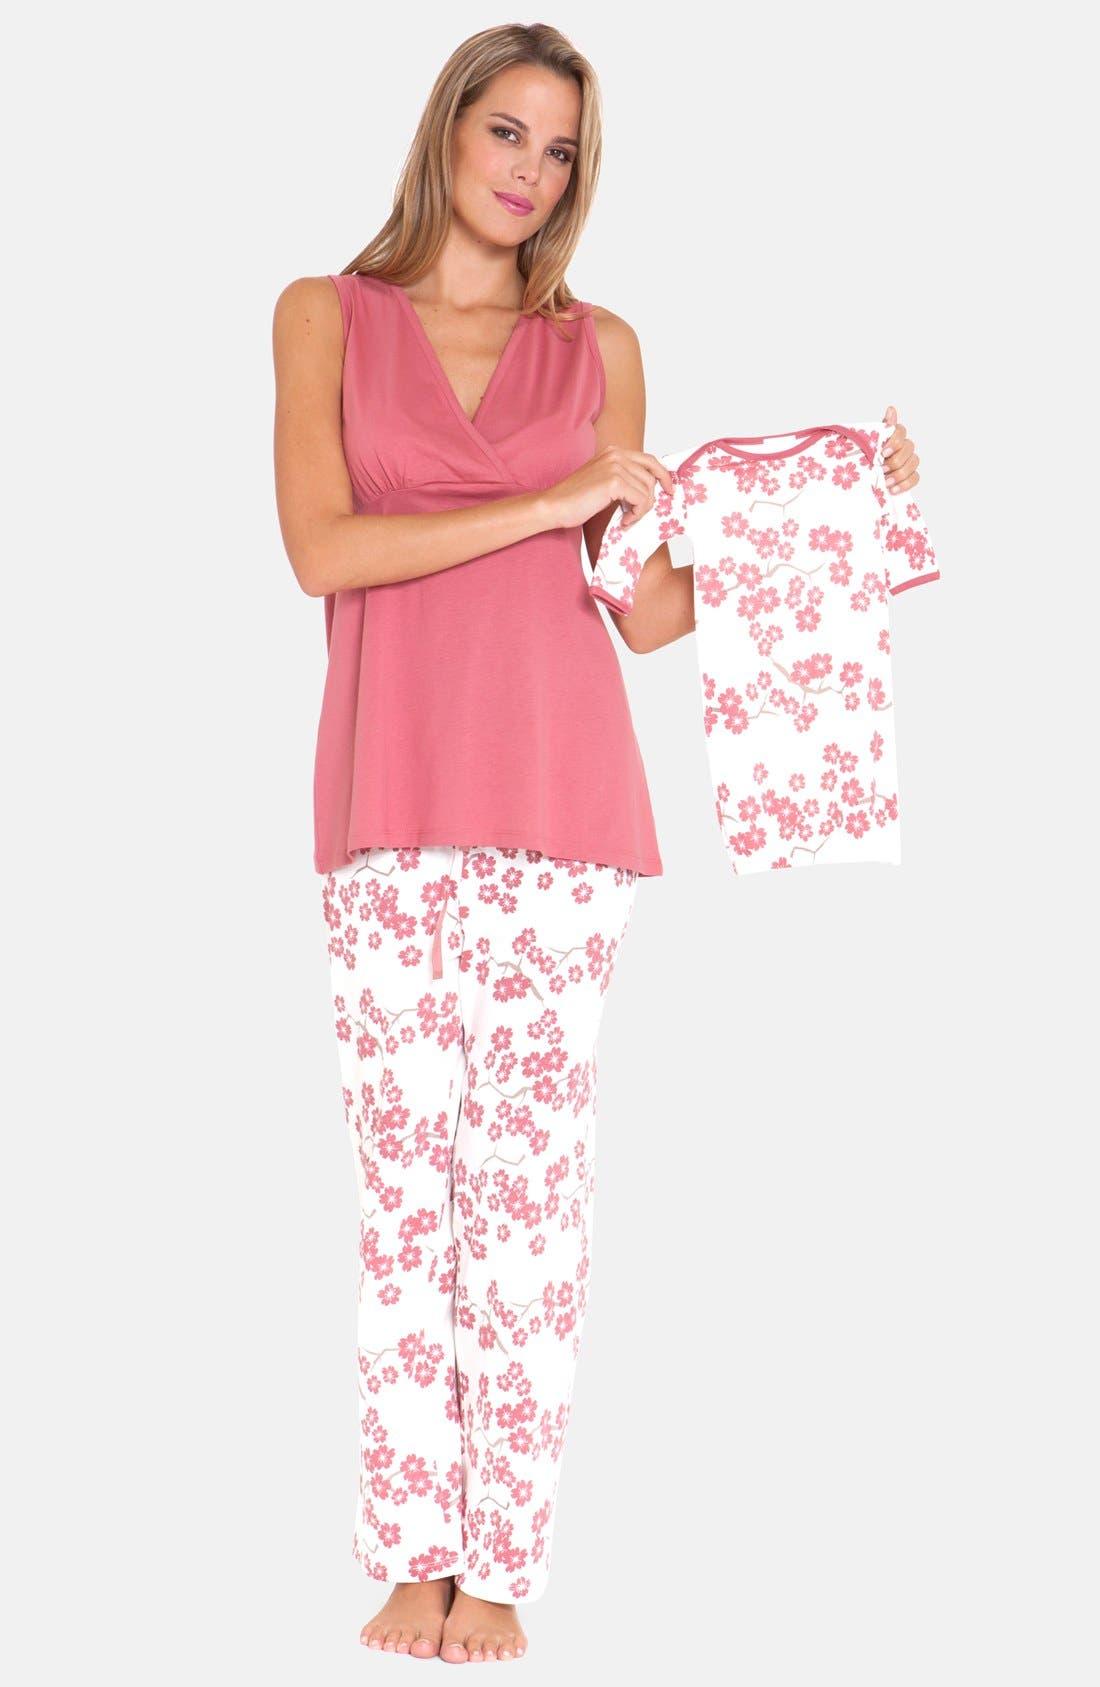 4-Piece Maternity Sleepwear Gift Set,                         Main,                         color,